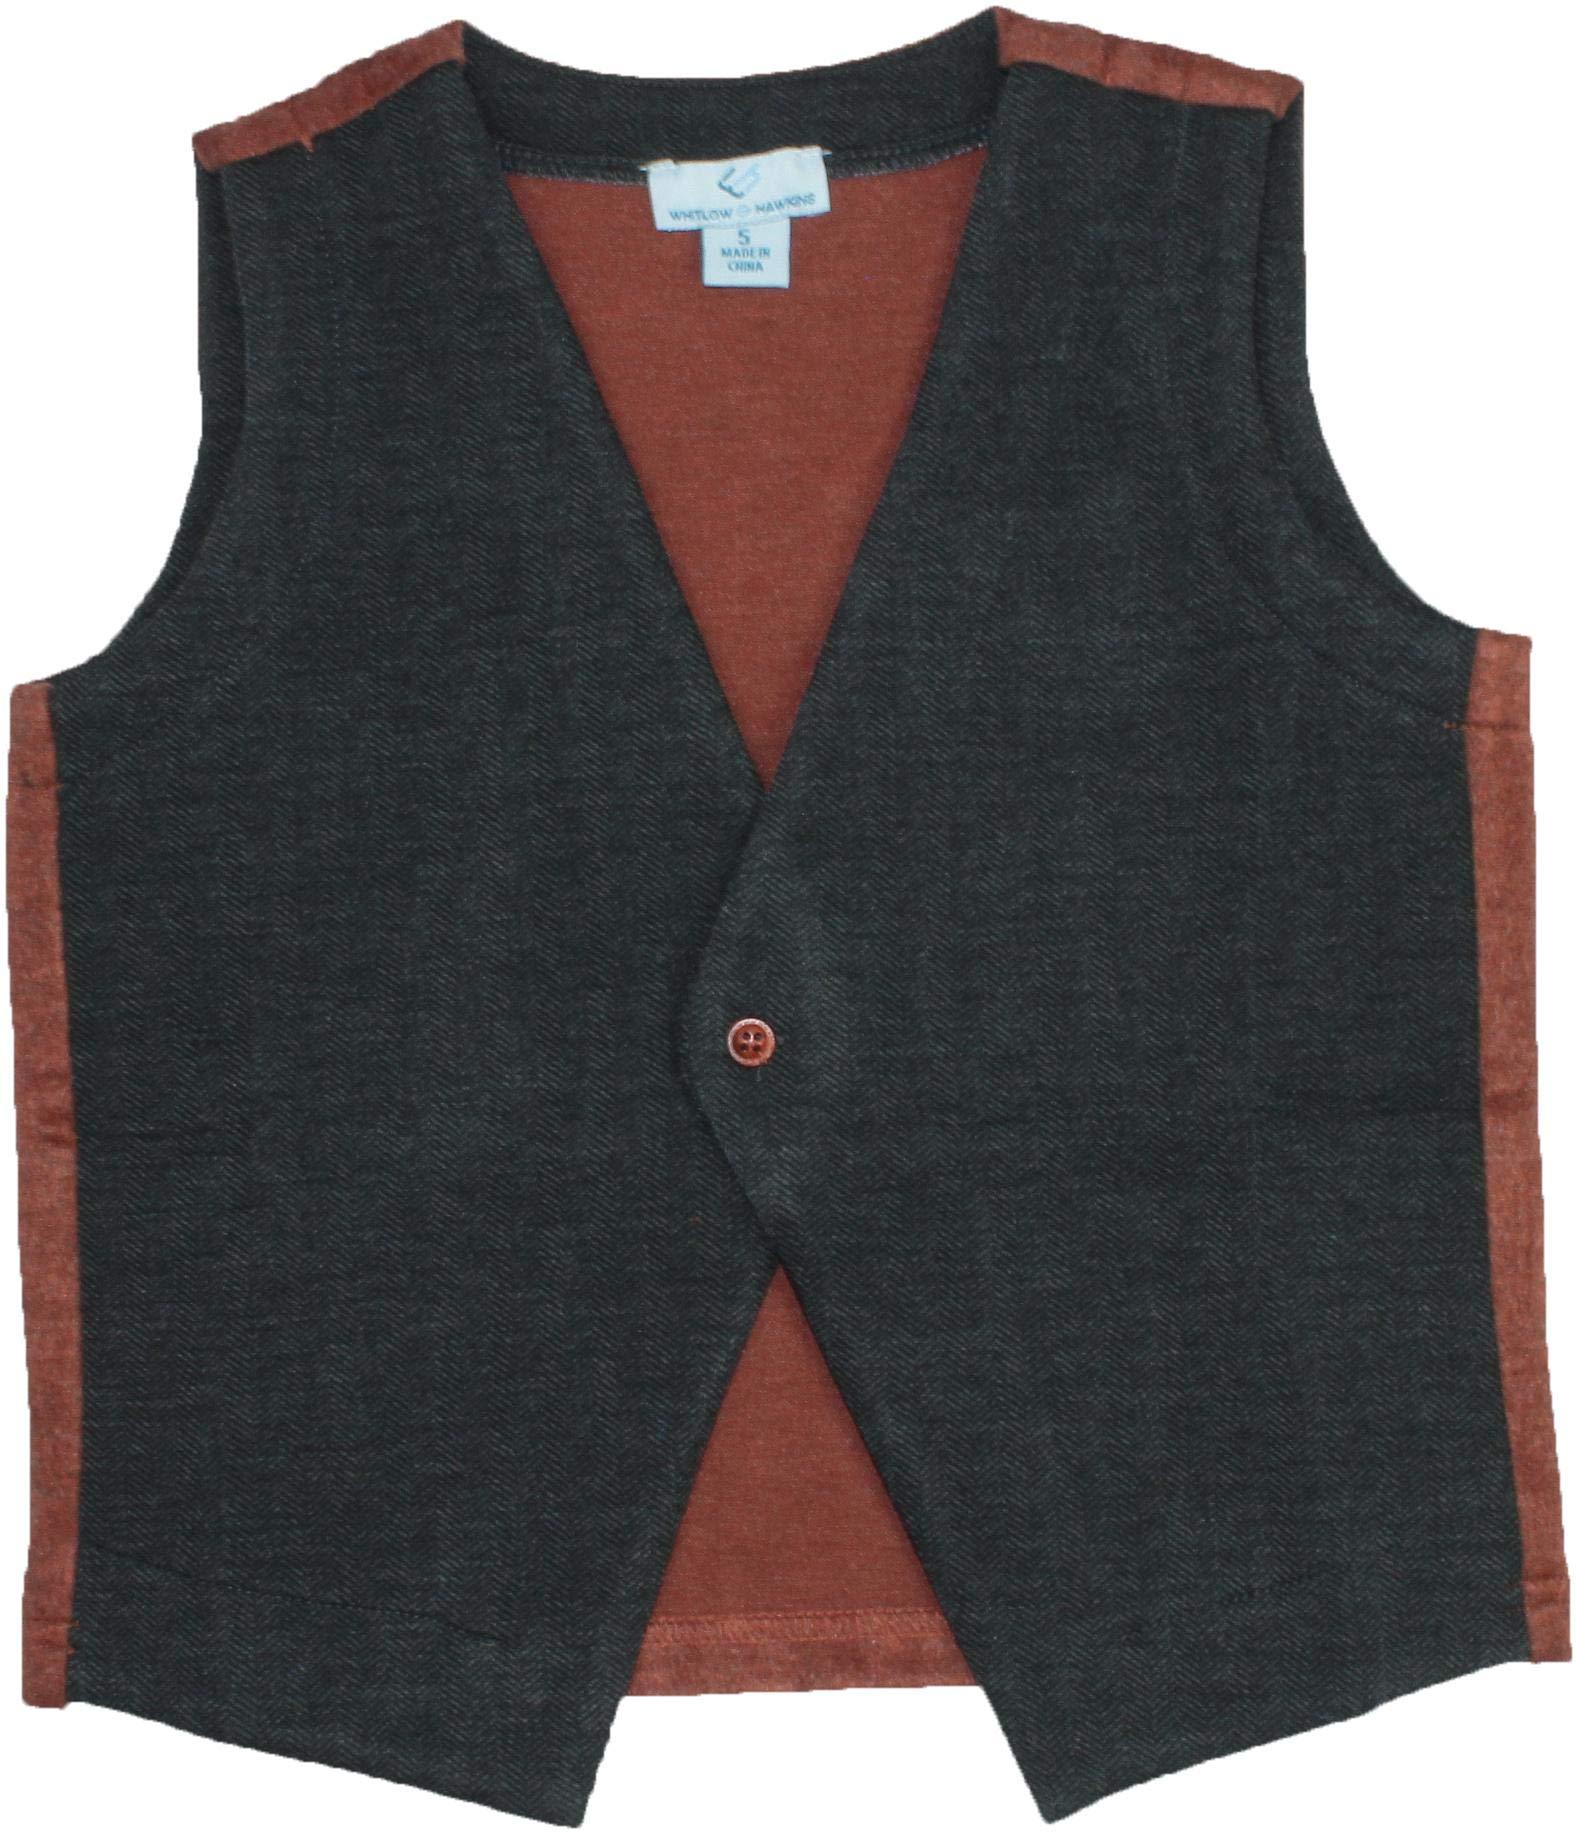 Whitlow & Hawkins Boys Vest - 6138 - Charcoal, 7